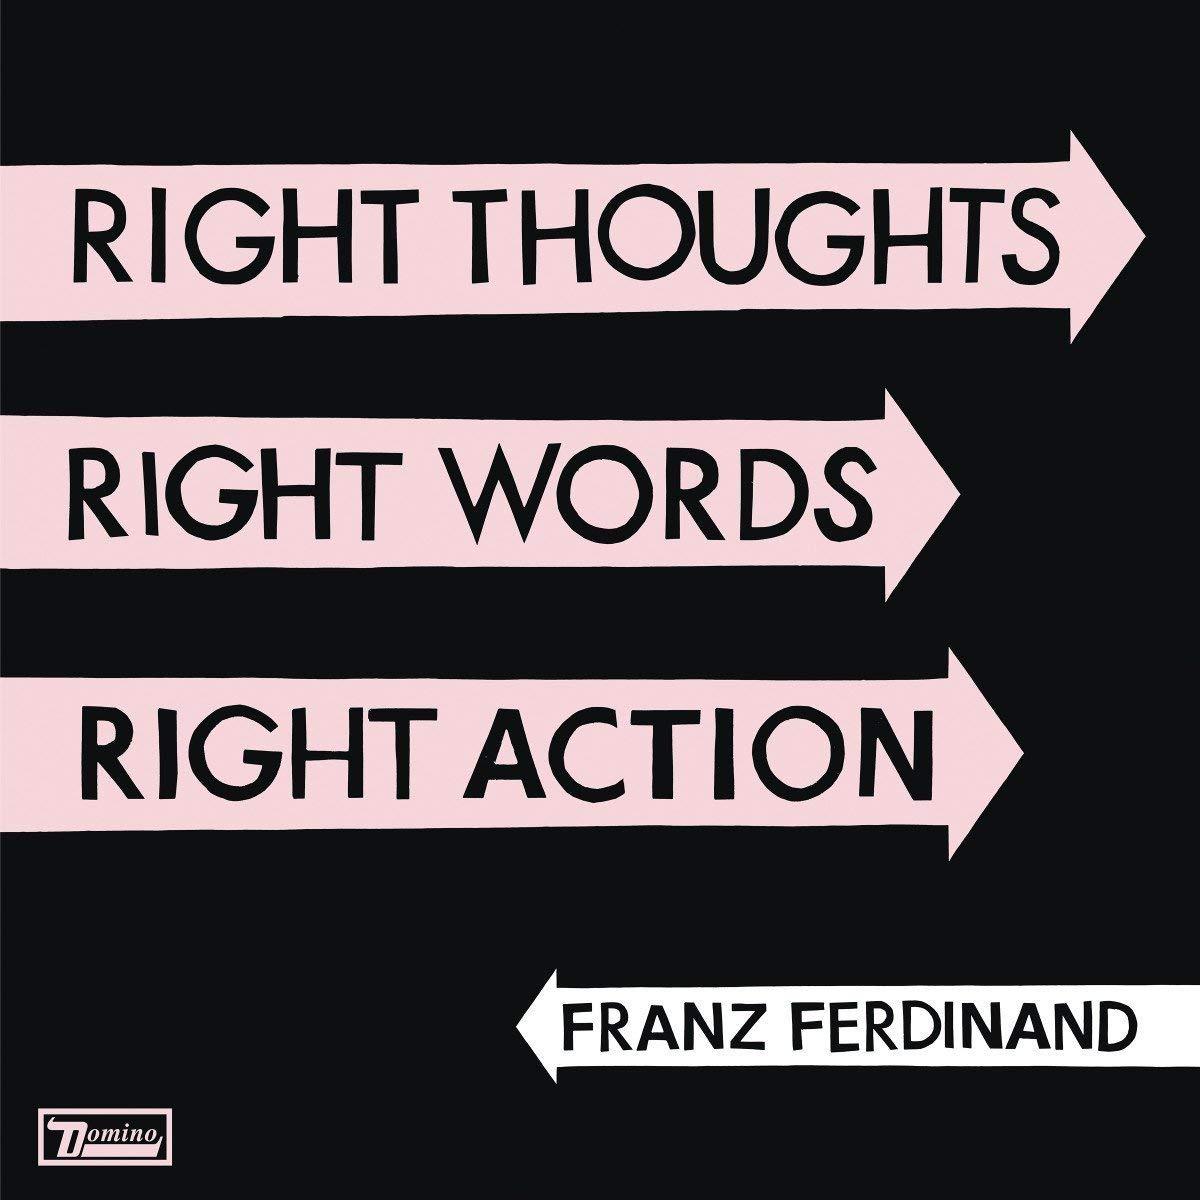 FRANZ FERDINAND   Right Thoughts, Right Words, Right Action, 2013, Joe Goddard & Alex Kapranos & Alexis Taylor, 35:04